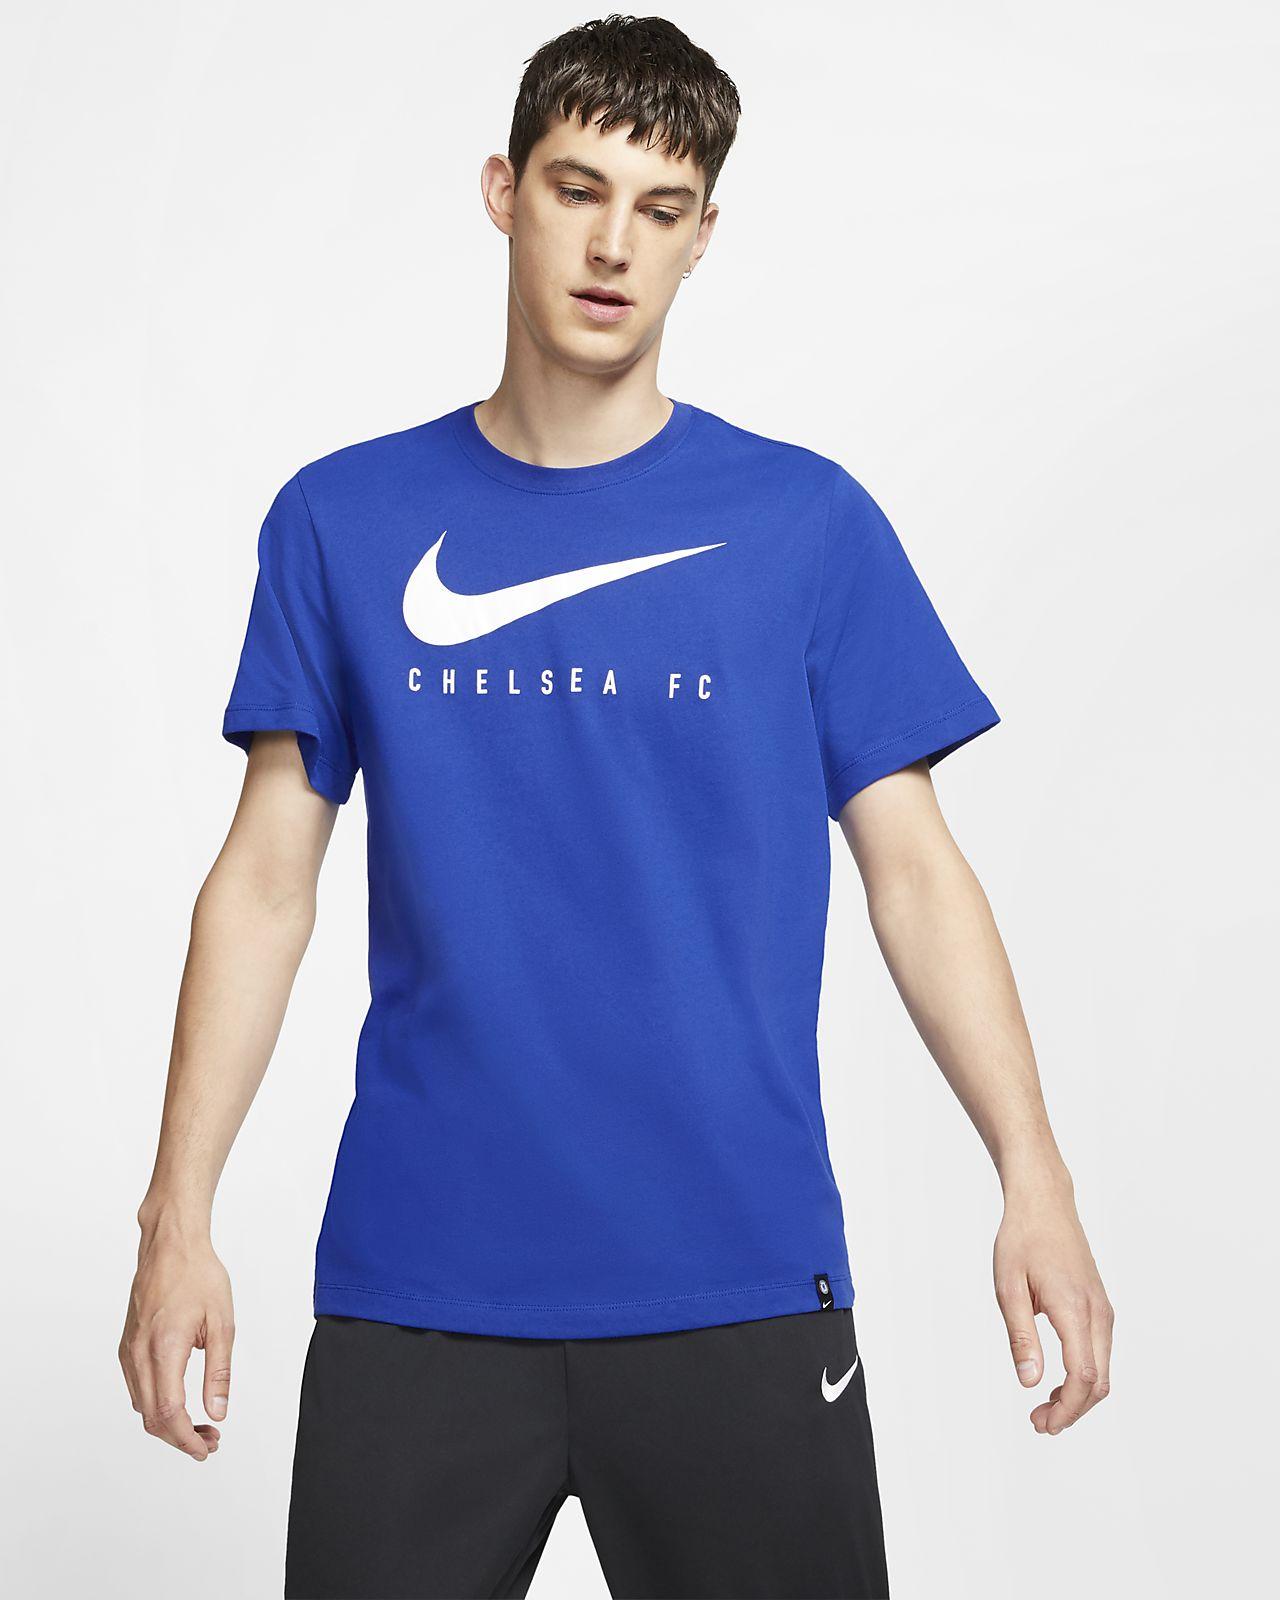 Nike Dri-FIT Chelsea FC Men's Football T-Shirt